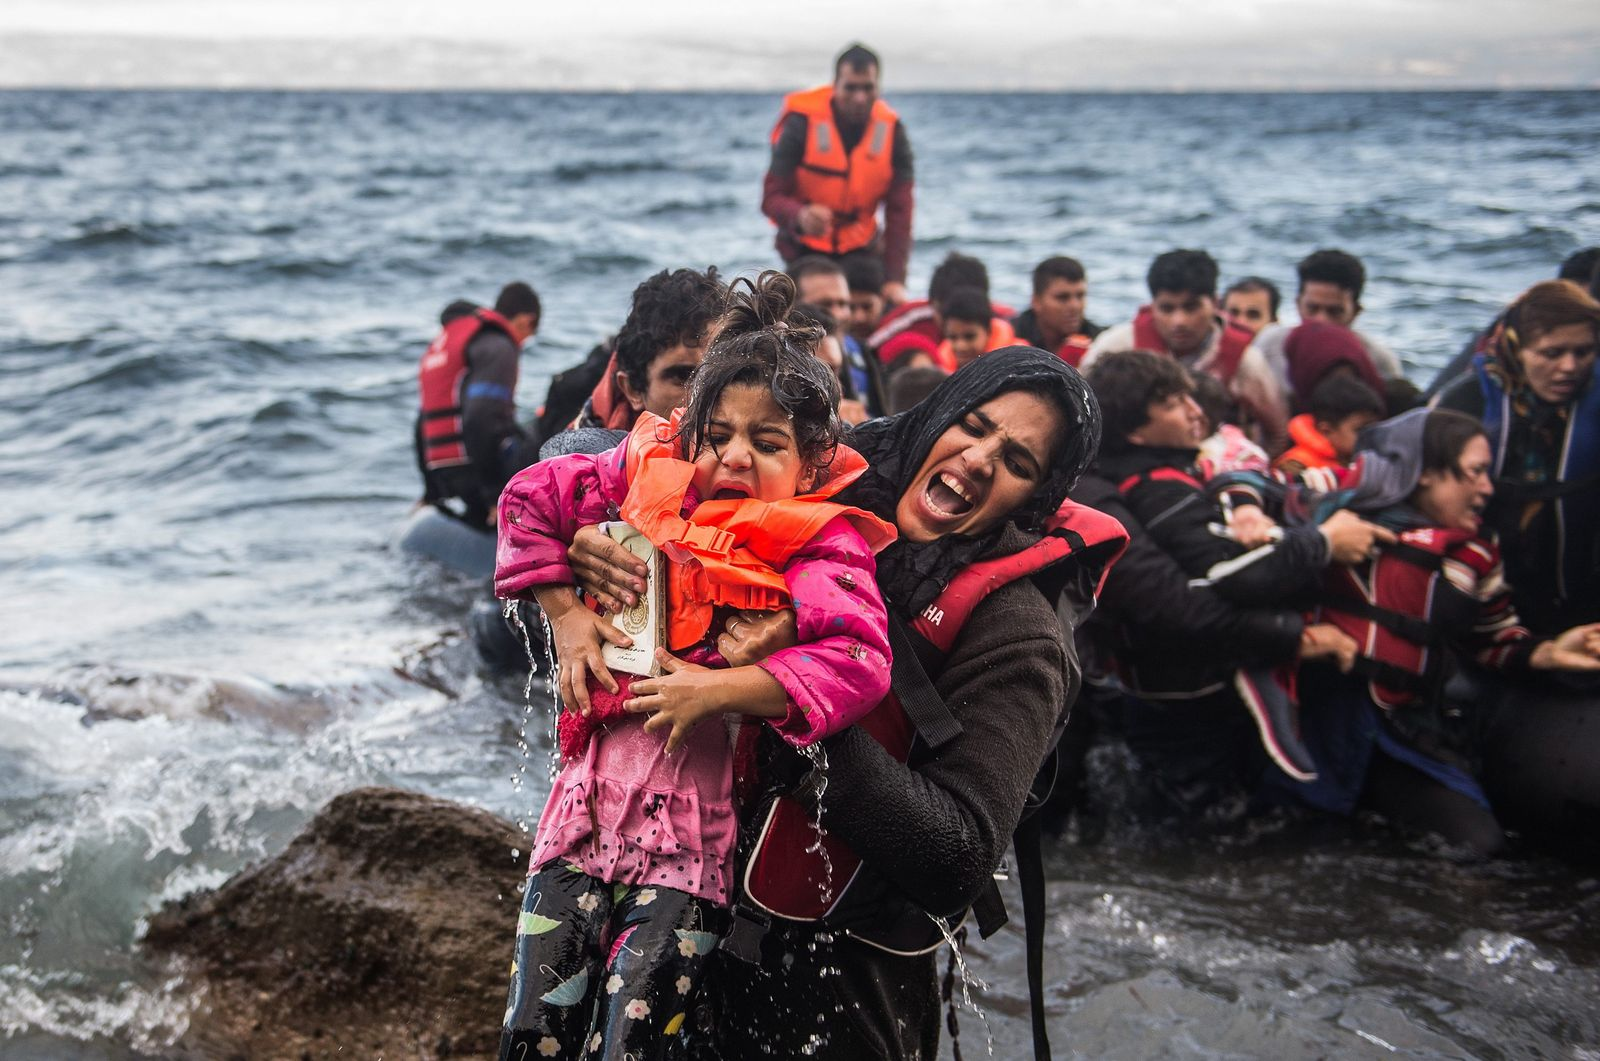 Refugees arriving in Greece